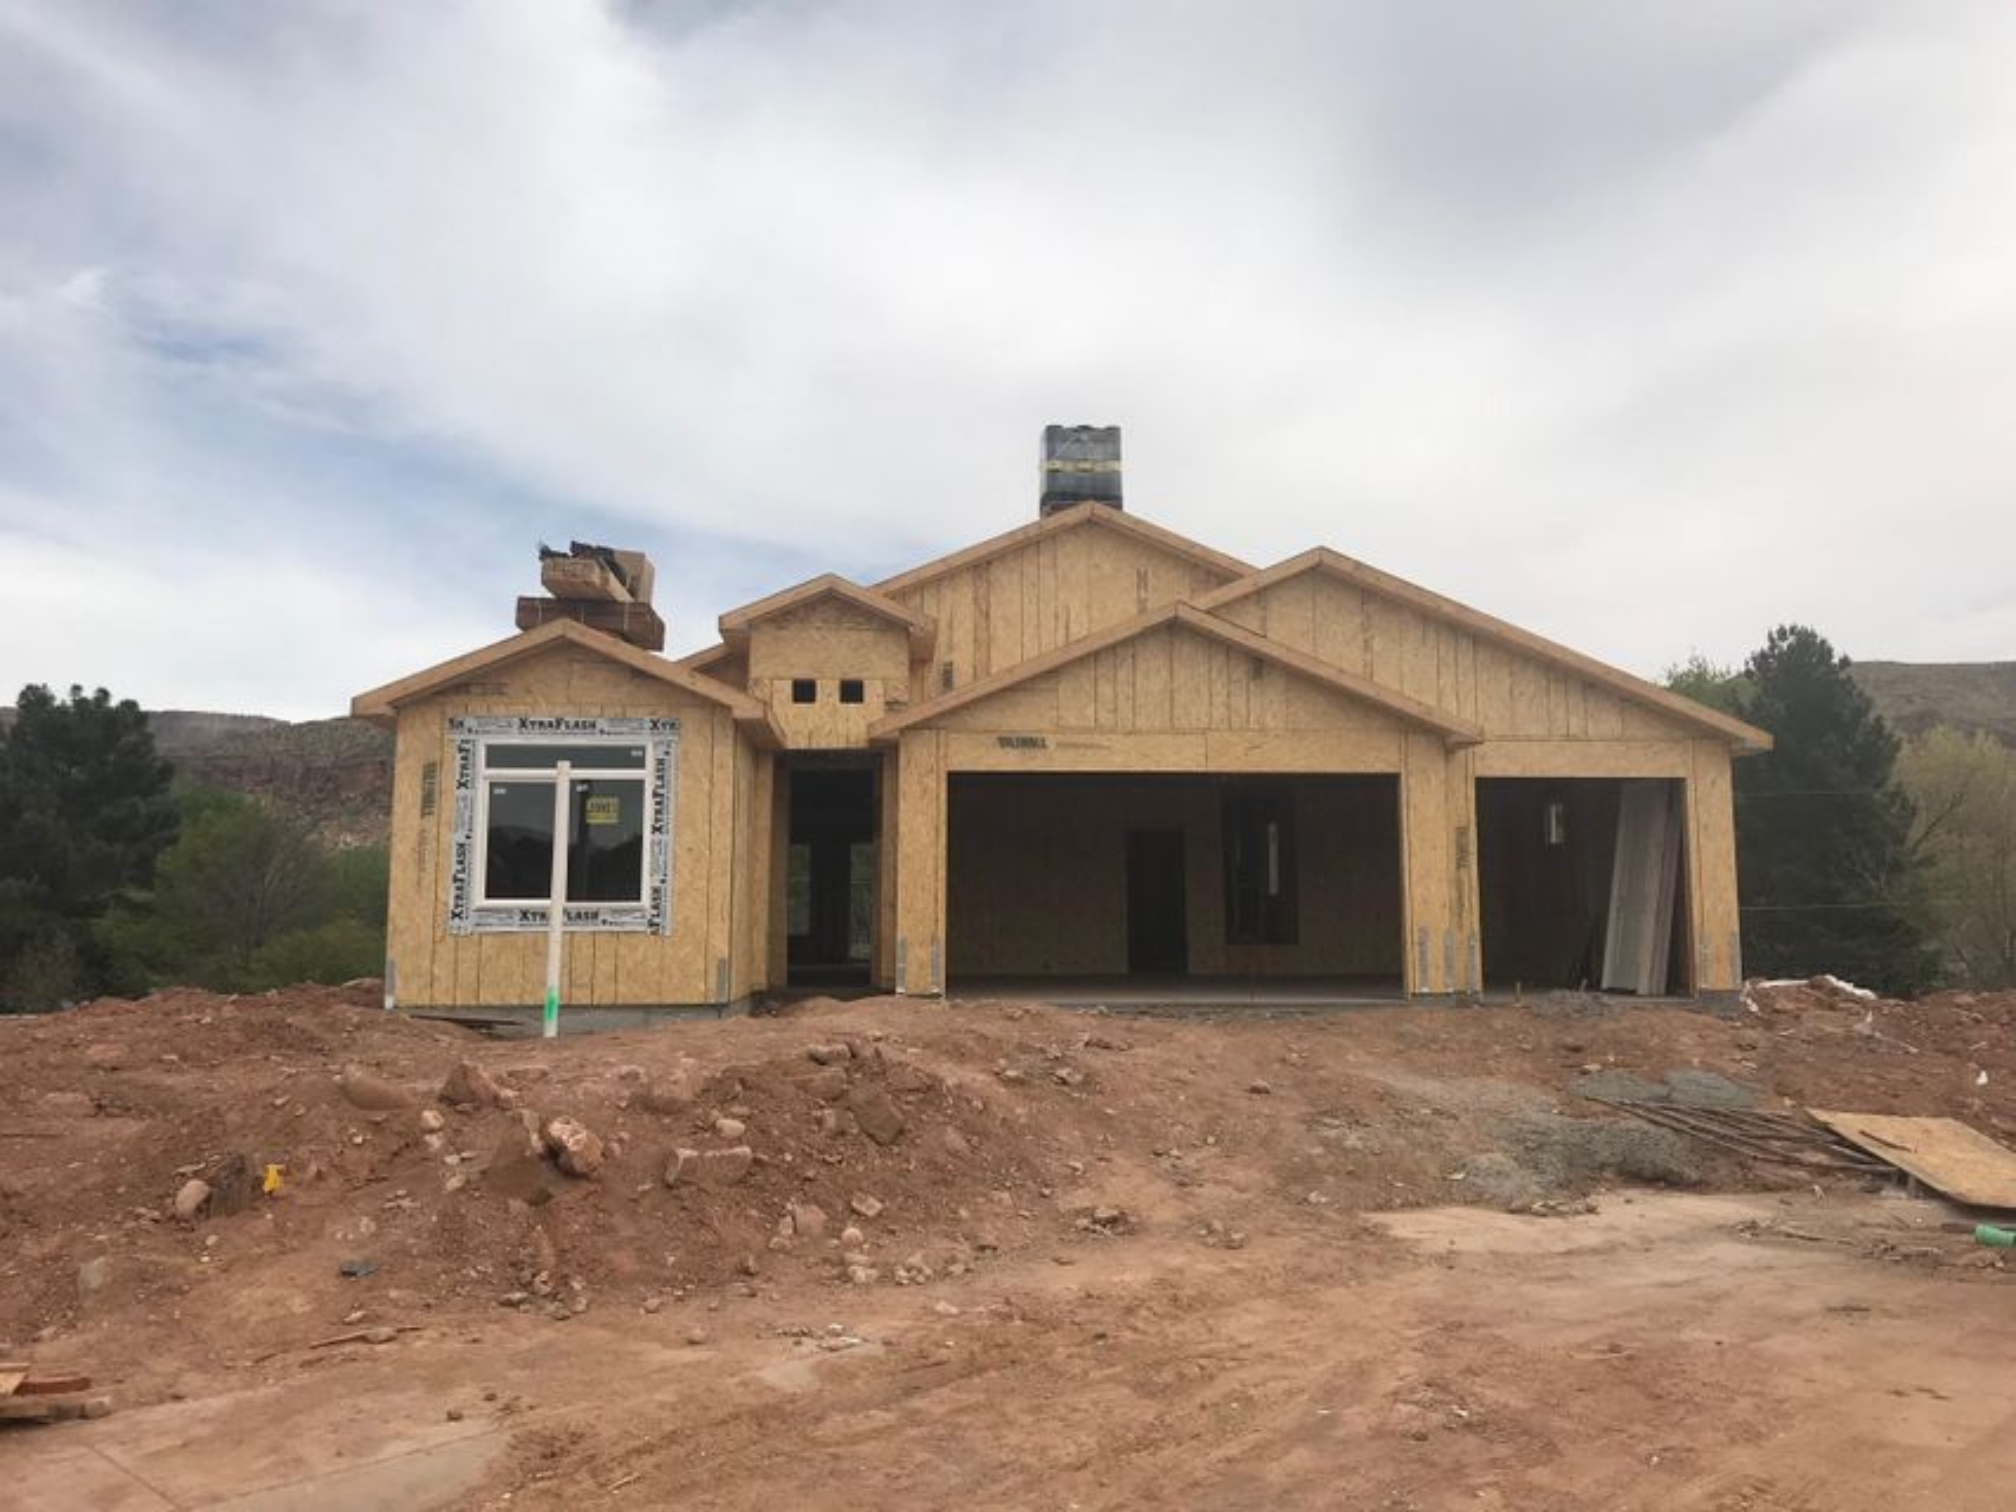 Single Family Home for Sale at 248 220 248 220 La Verkin, Utah 84745 United States